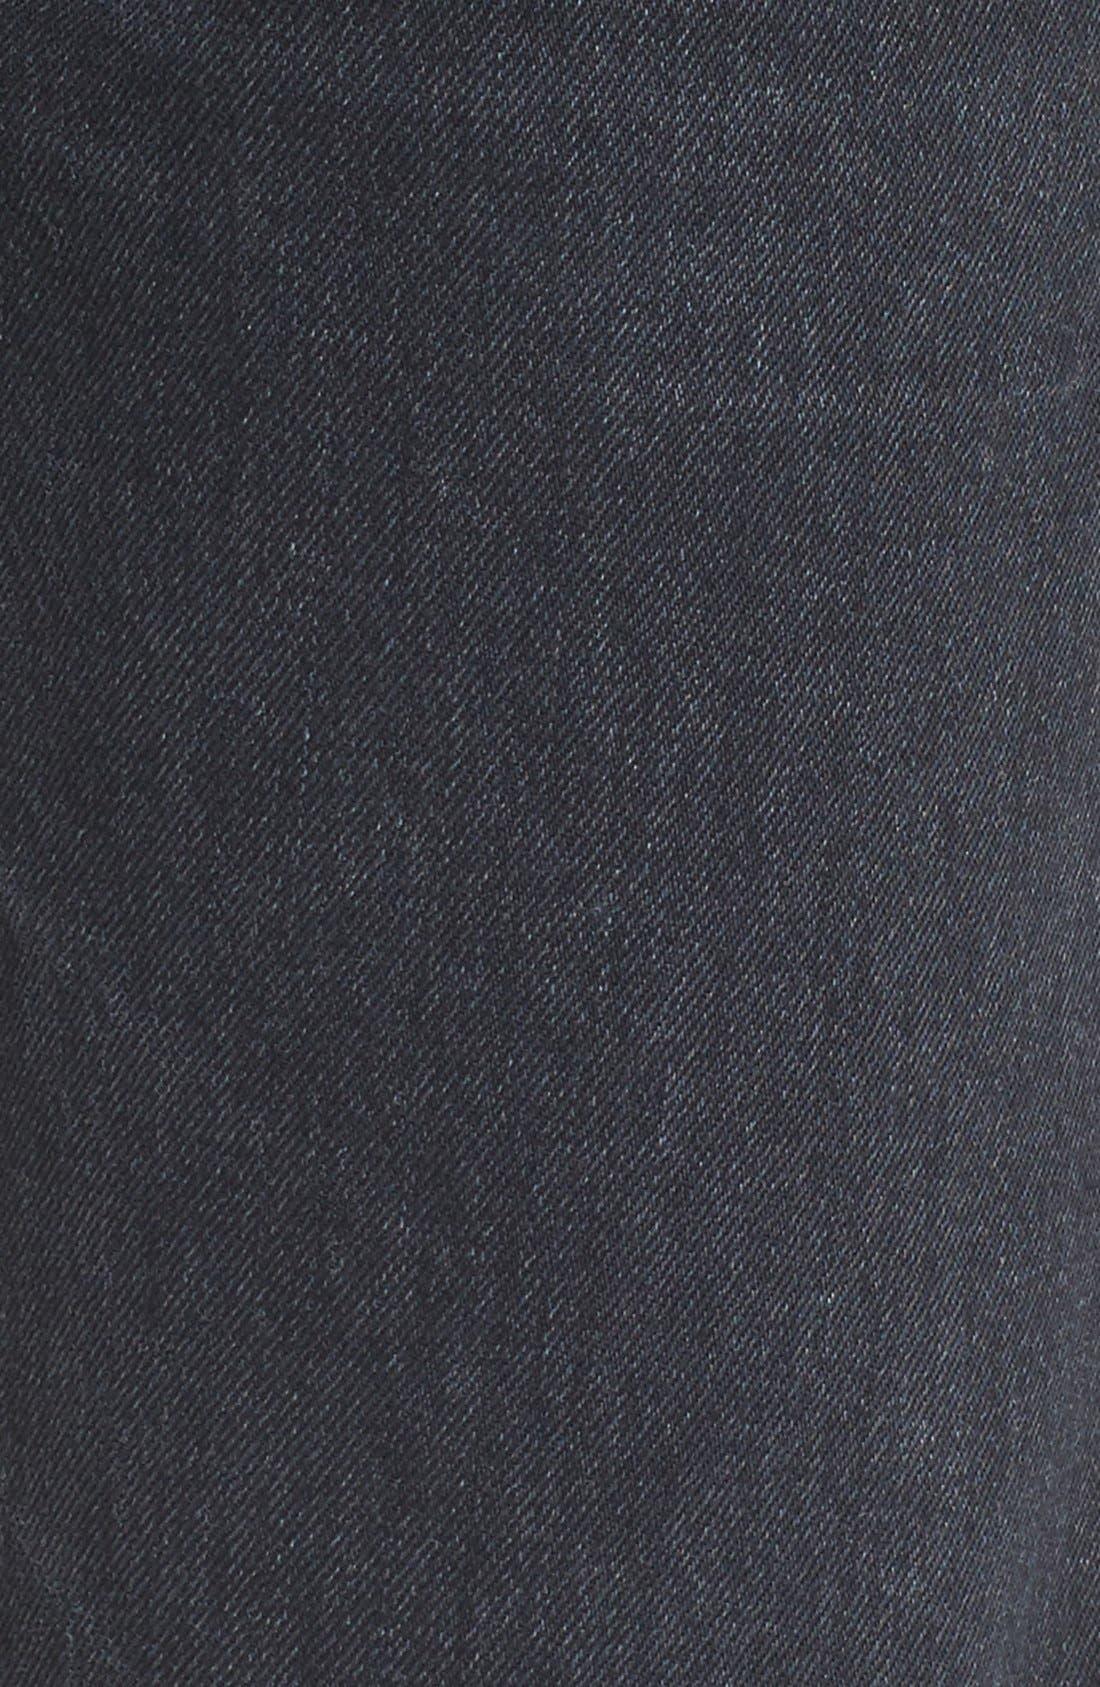 Emerson Slim Boyfriend Jeans,                             Alternate thumbnail 5, color,                             Black Hawk